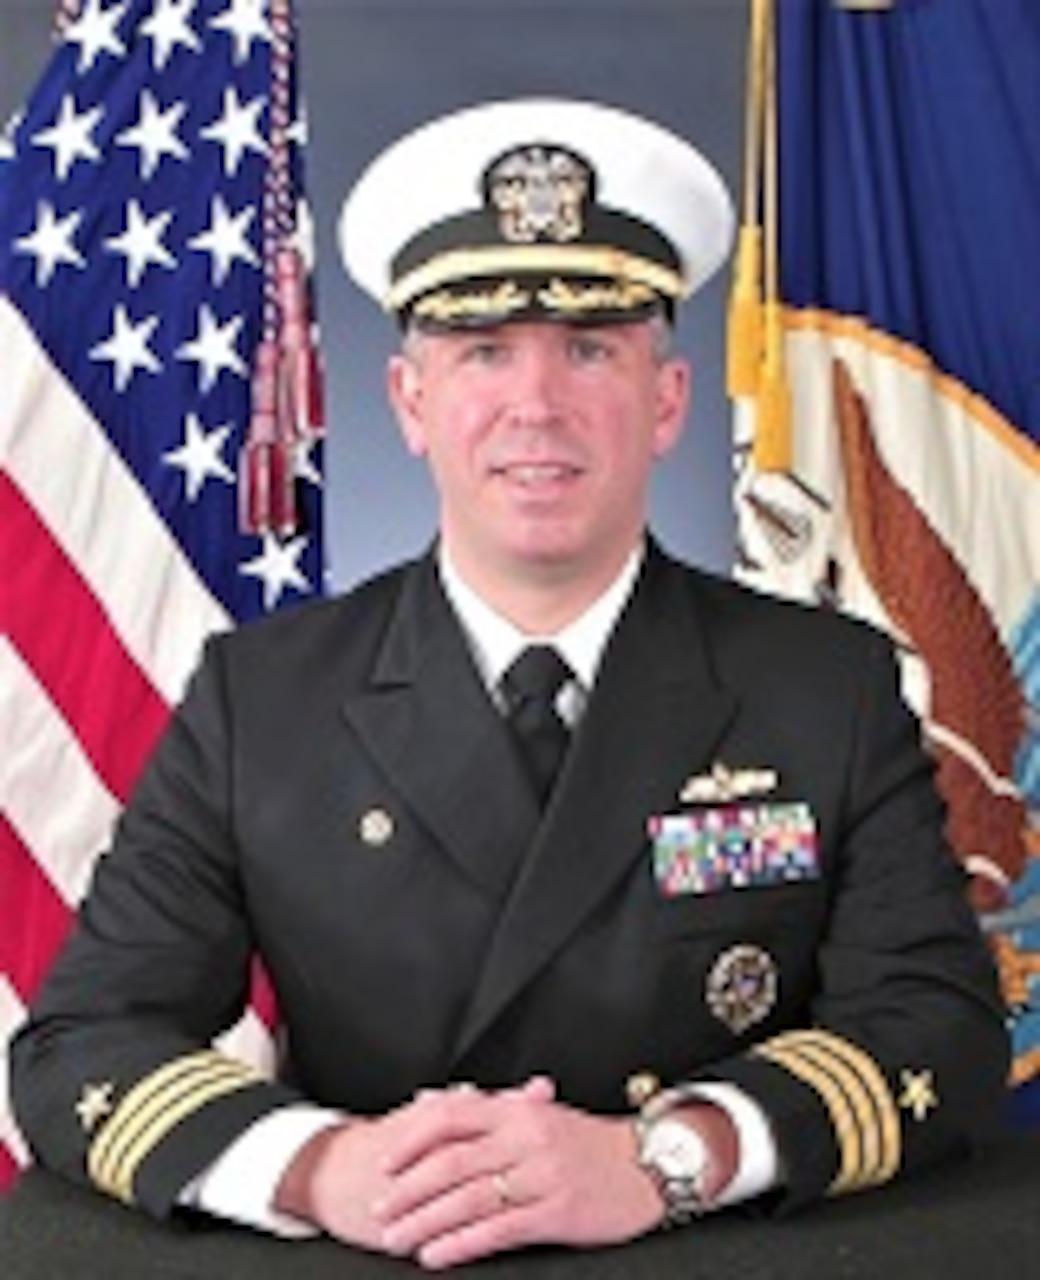 Commander Scott T. Wilbur